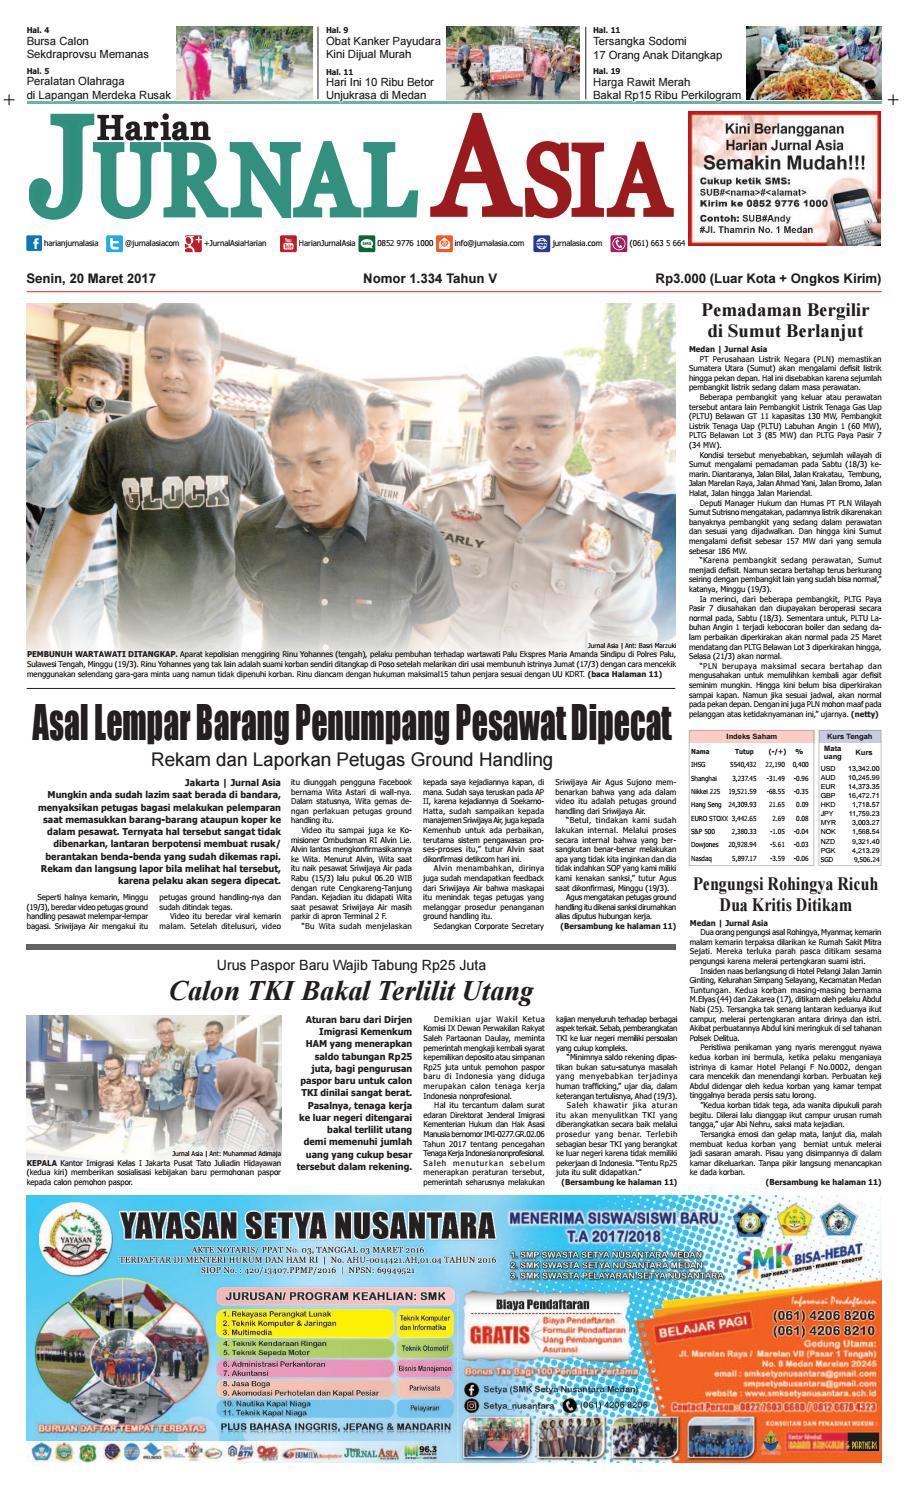 Harian Jurnal Asia Edisi Senin 20 Maret 2017 By Produk Ukm Bumn Kain Batik Eksklusif Lasem Manuk Medan Issuu